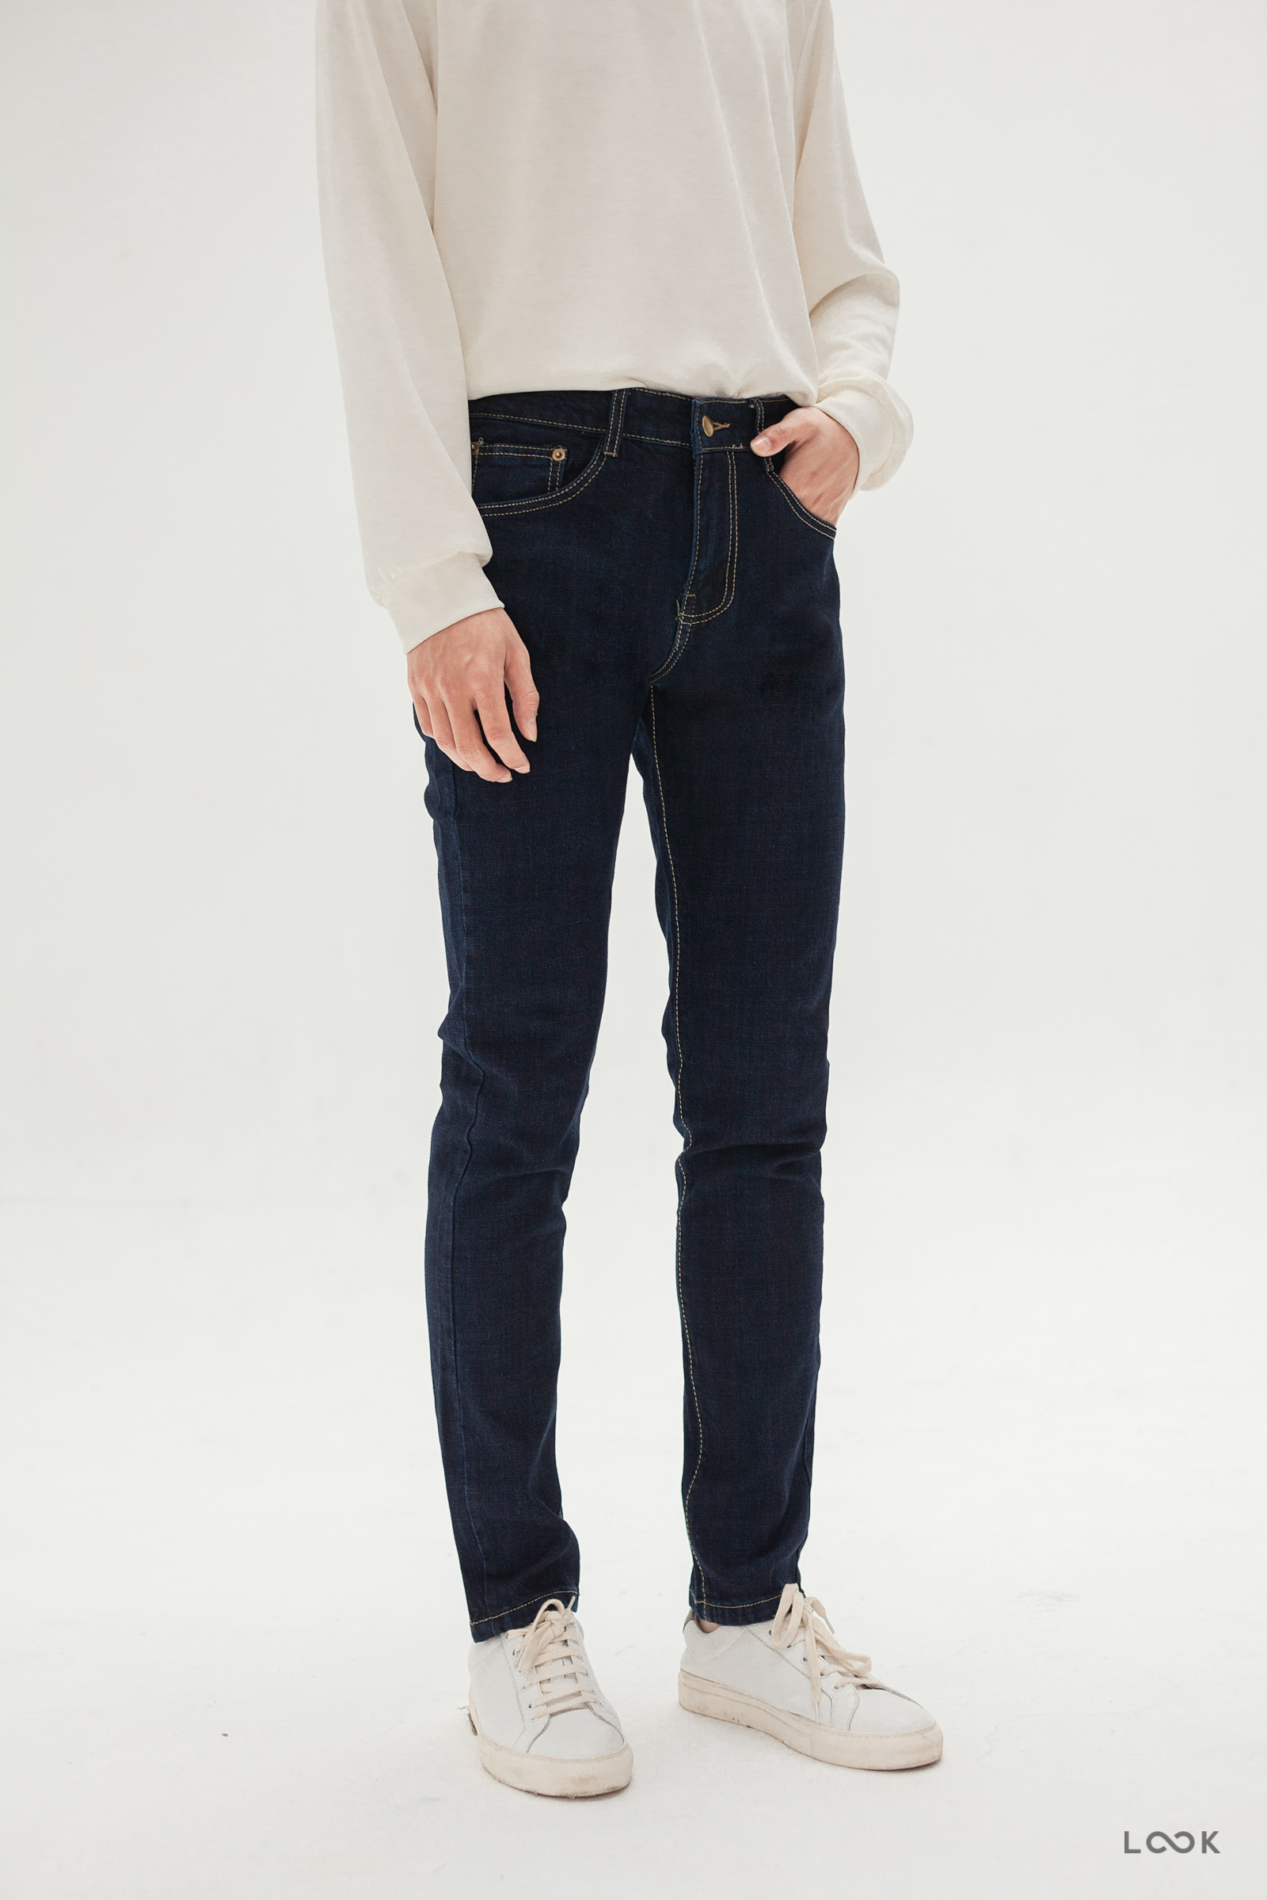 Look Polo Blue Jean